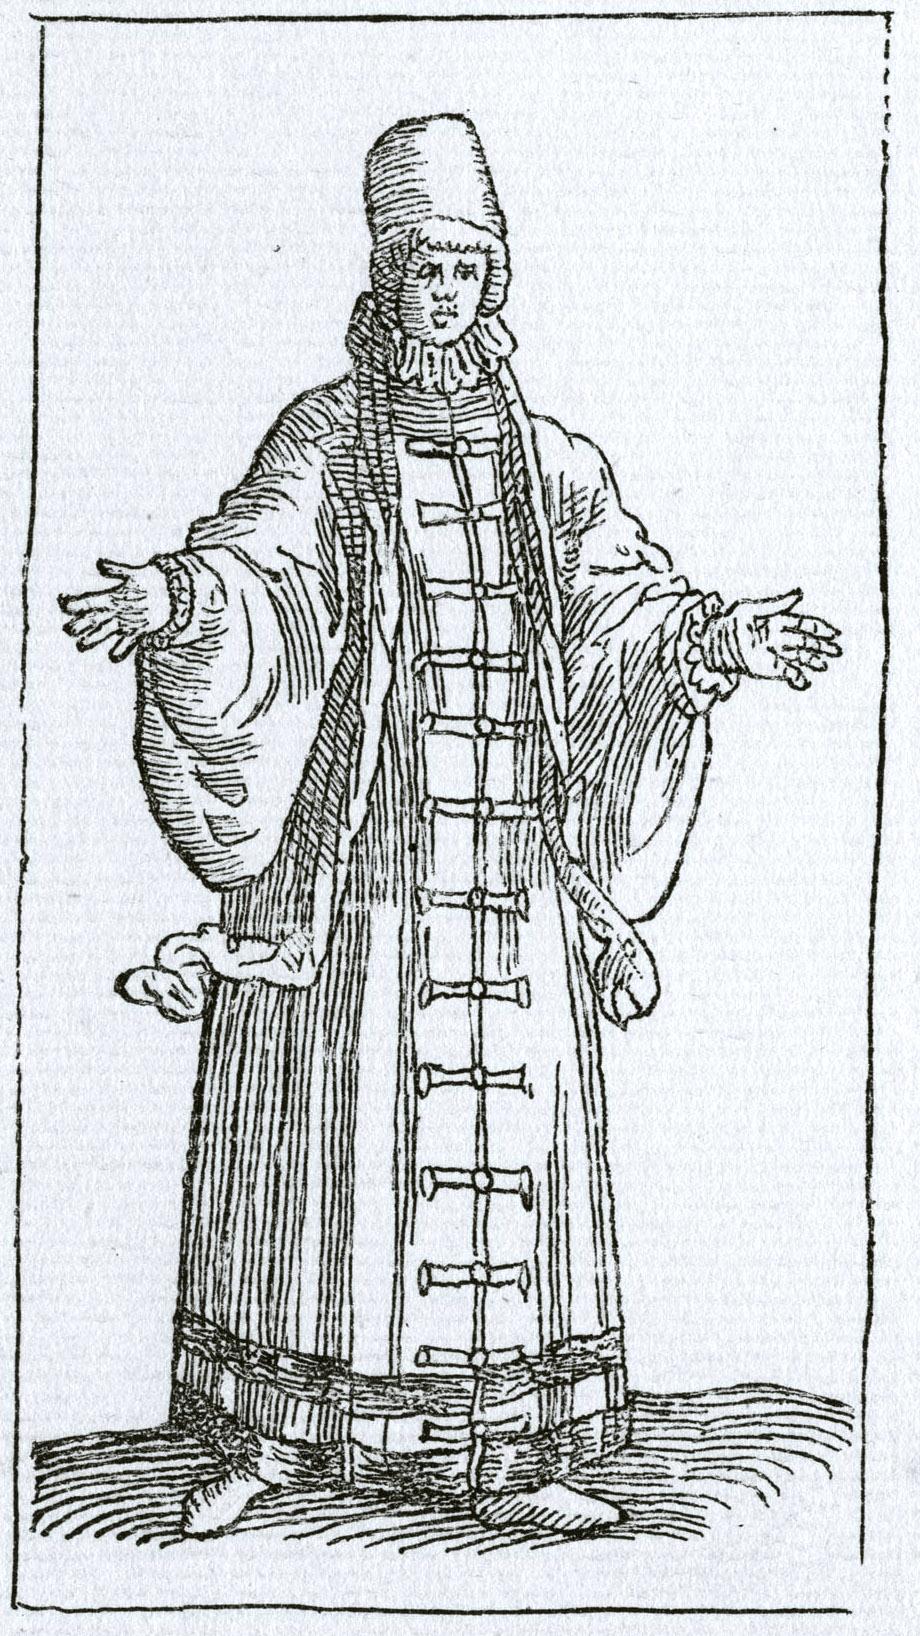 138. Гравюра из книги Чезаре Вечеллио, 1598